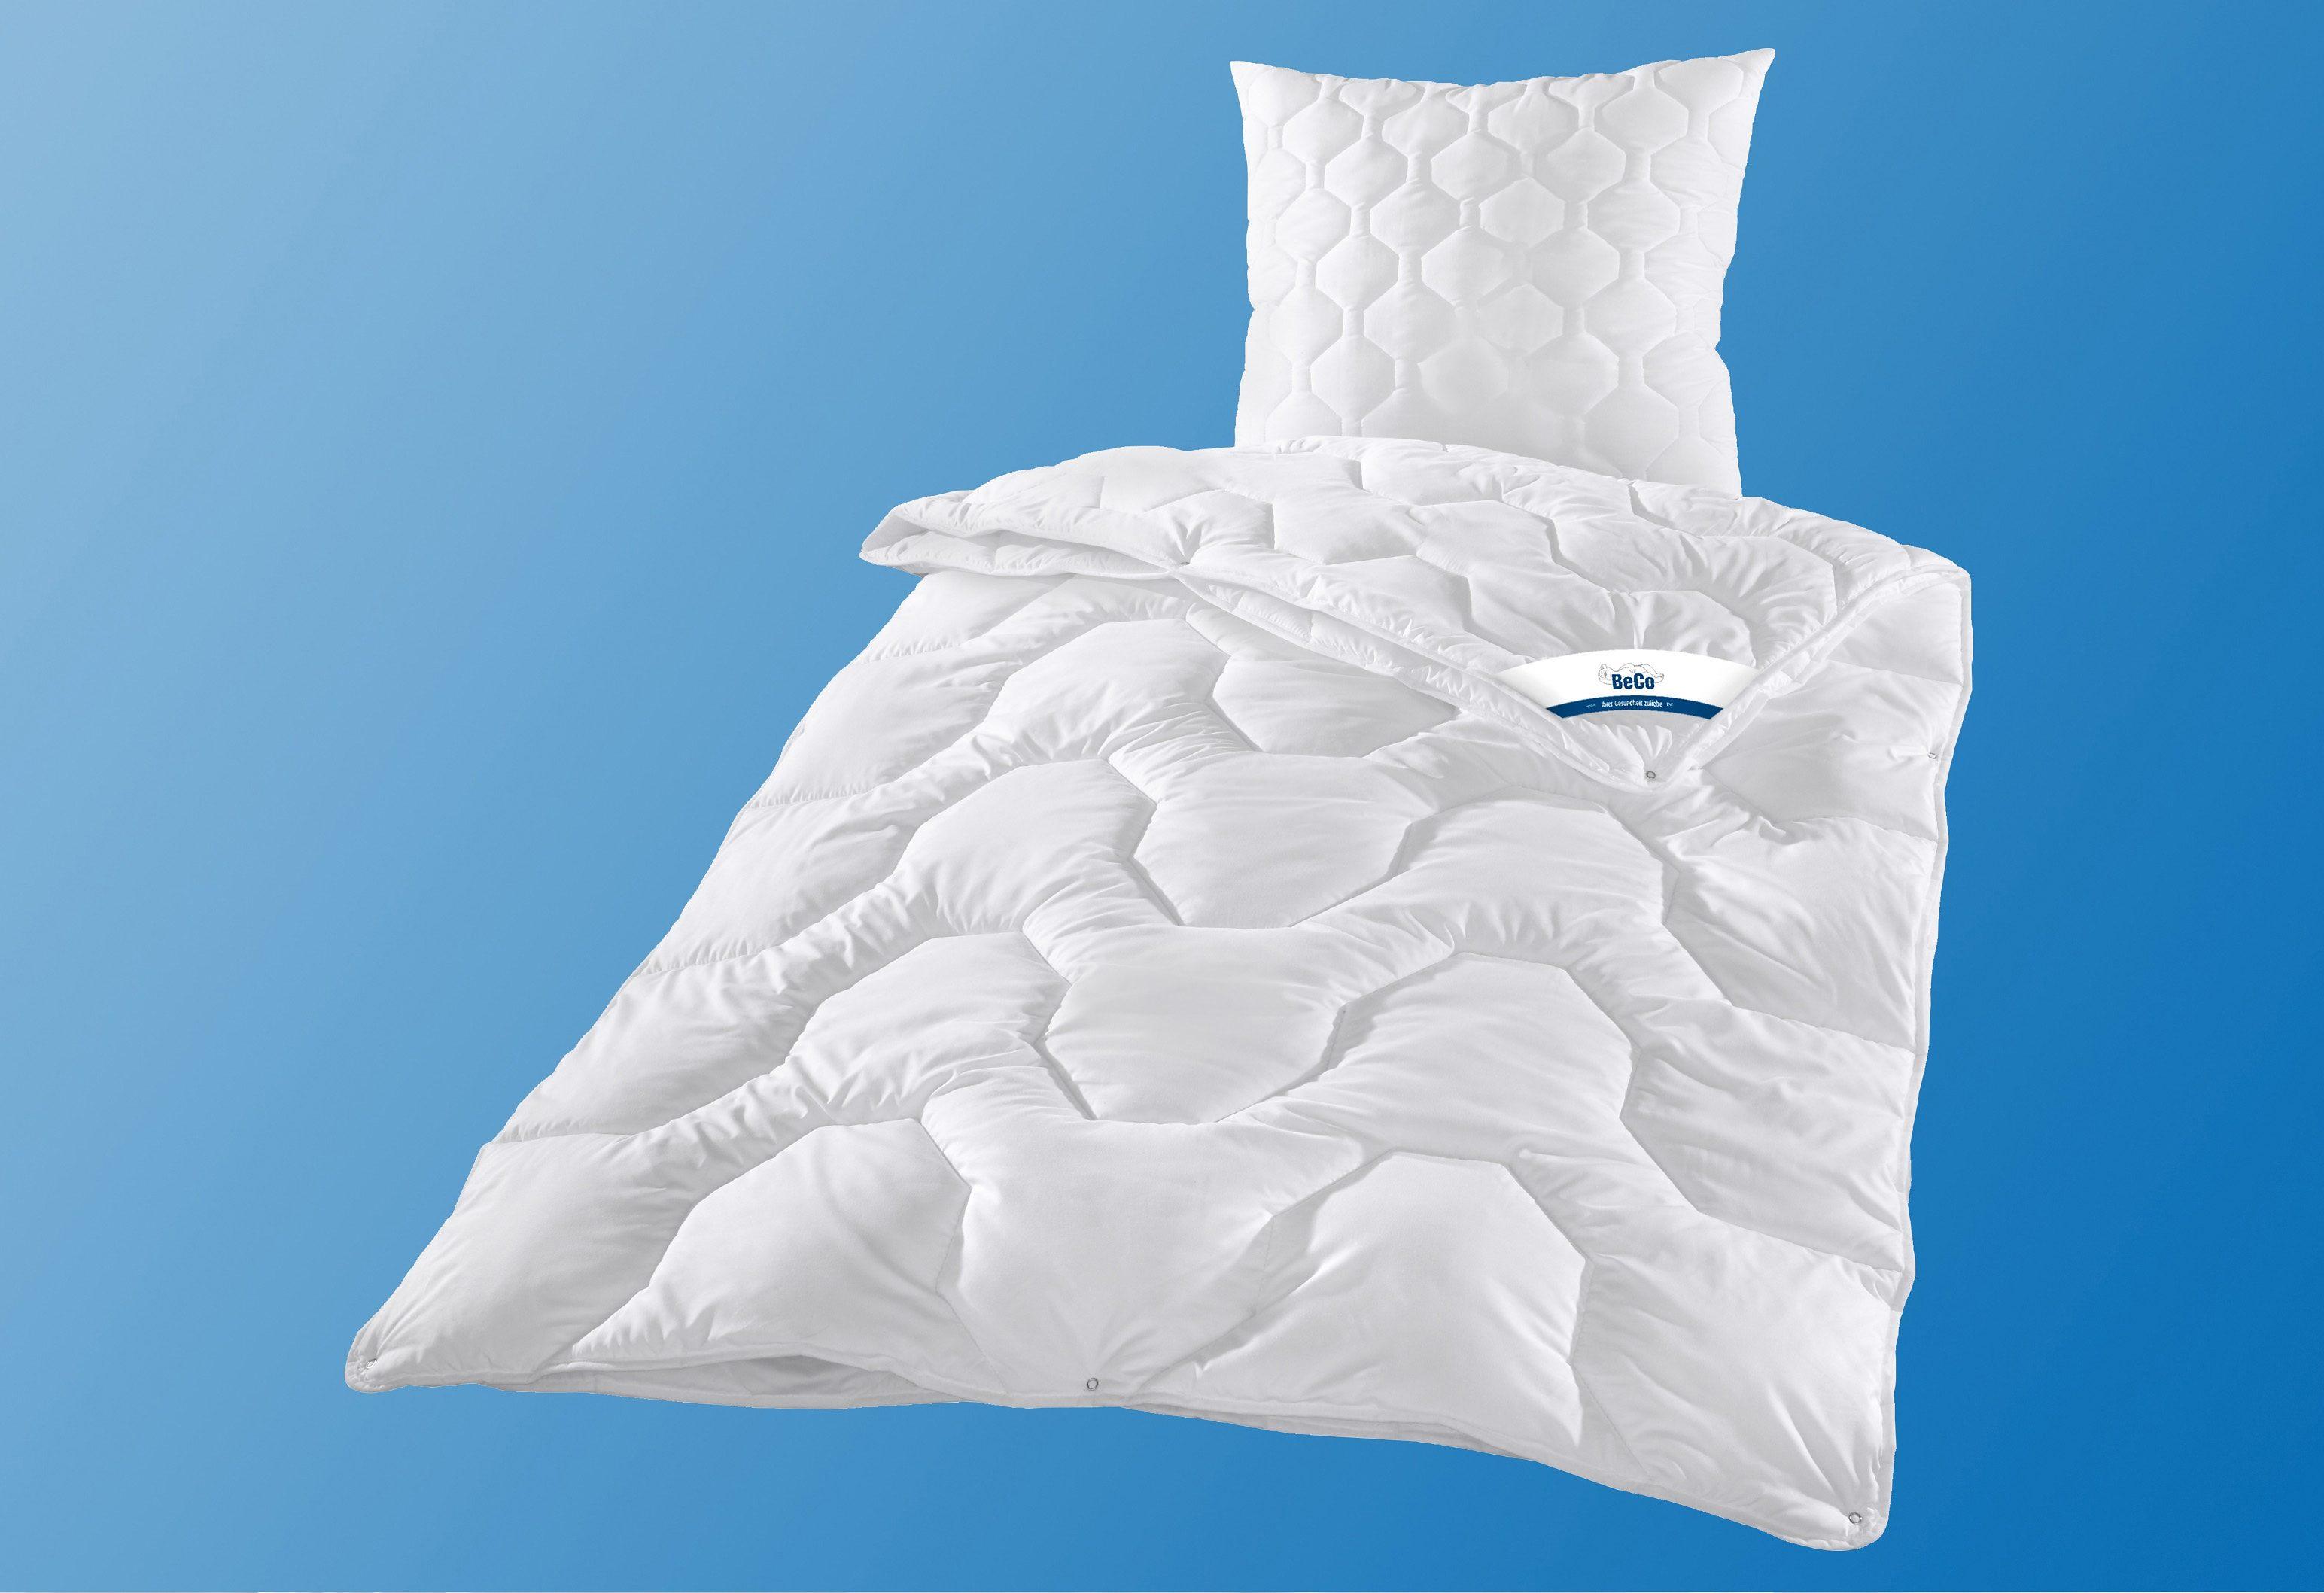 Bettdeckenset, »Cotton 95«, BeCo, 4-Jahreszeiten, Leichtdecke gratis, kochfest